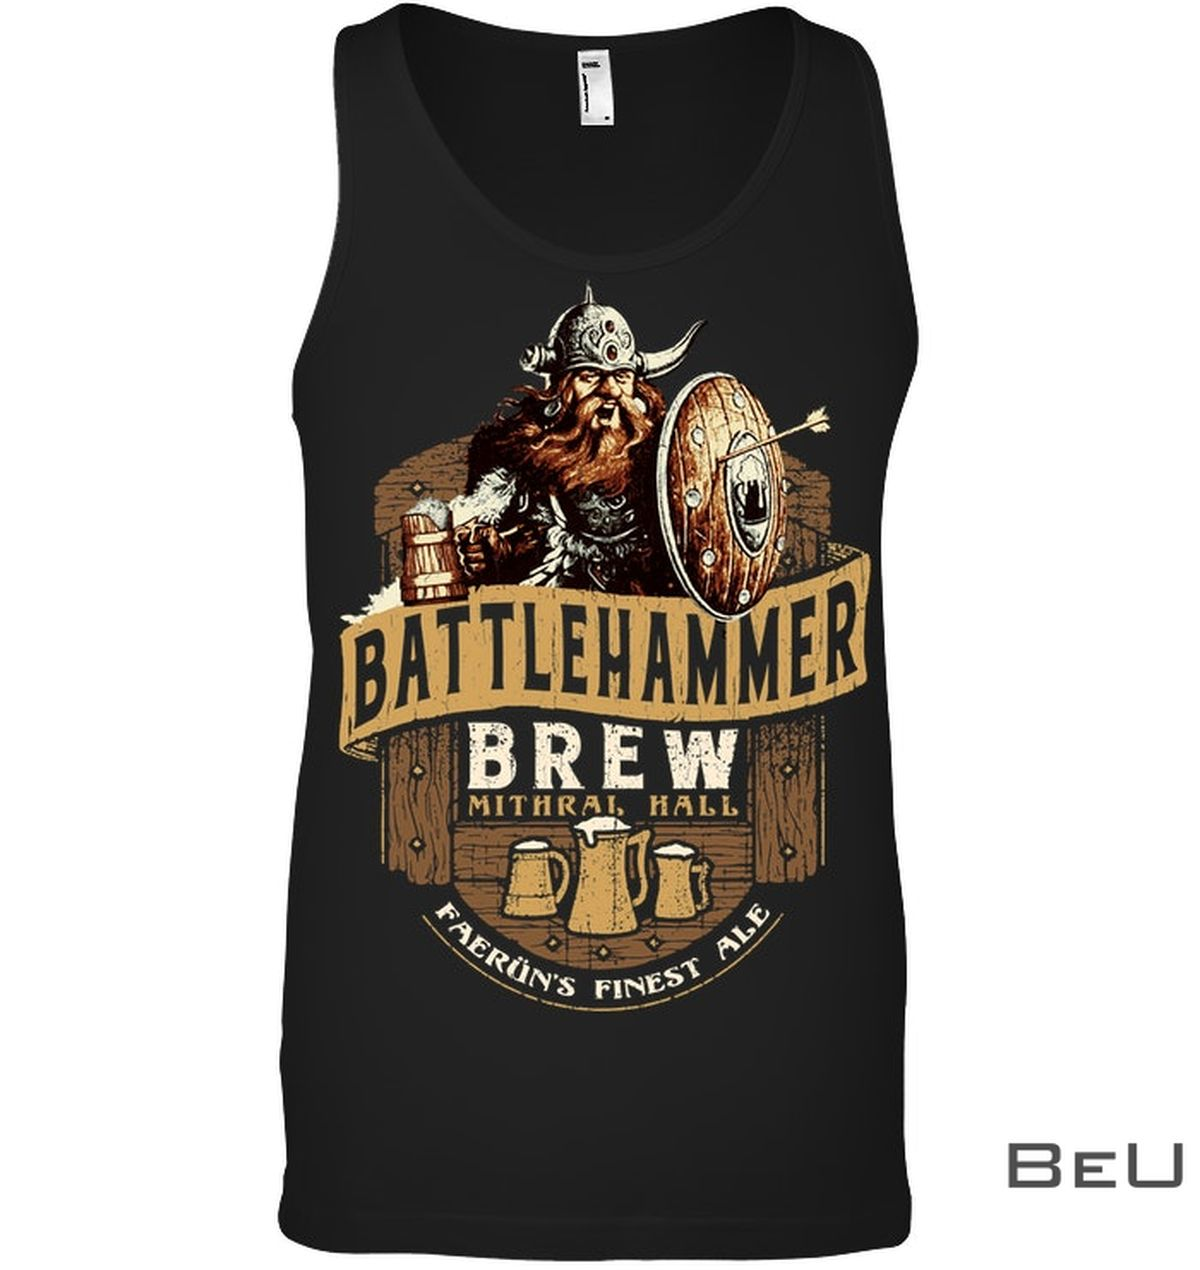 Battlehammer Brew Mithral Hall Faerun Finest Ale Shirtx